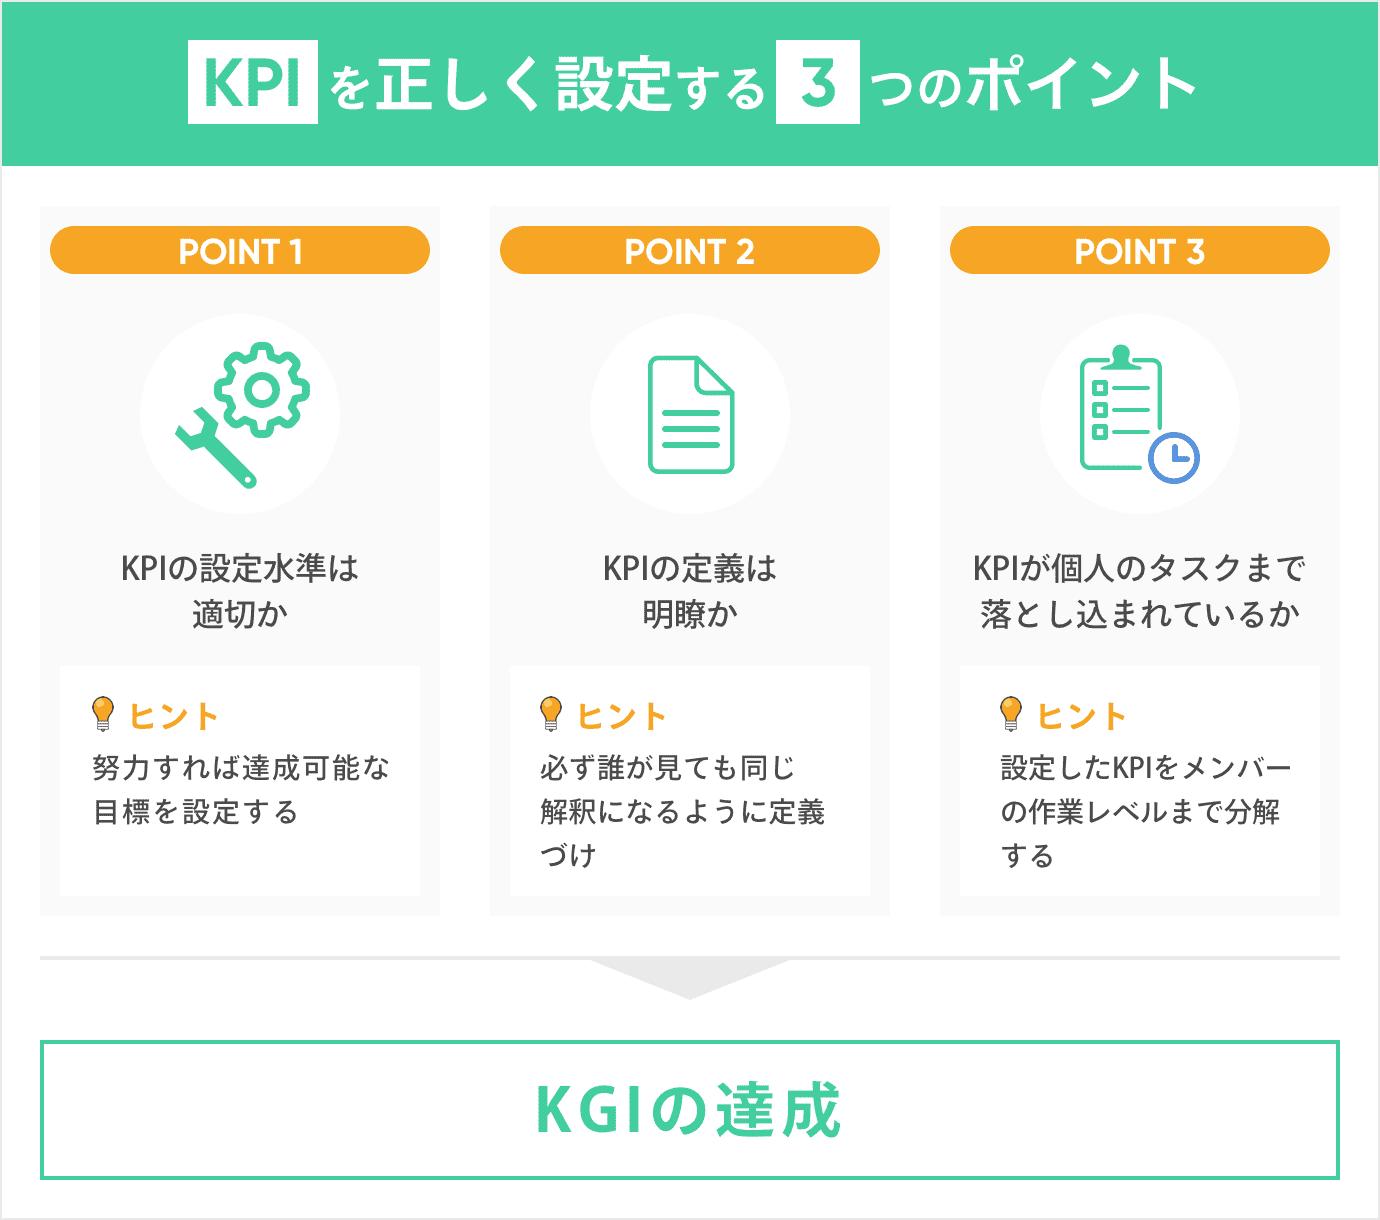 KPIを正しく設定する3つのポイント